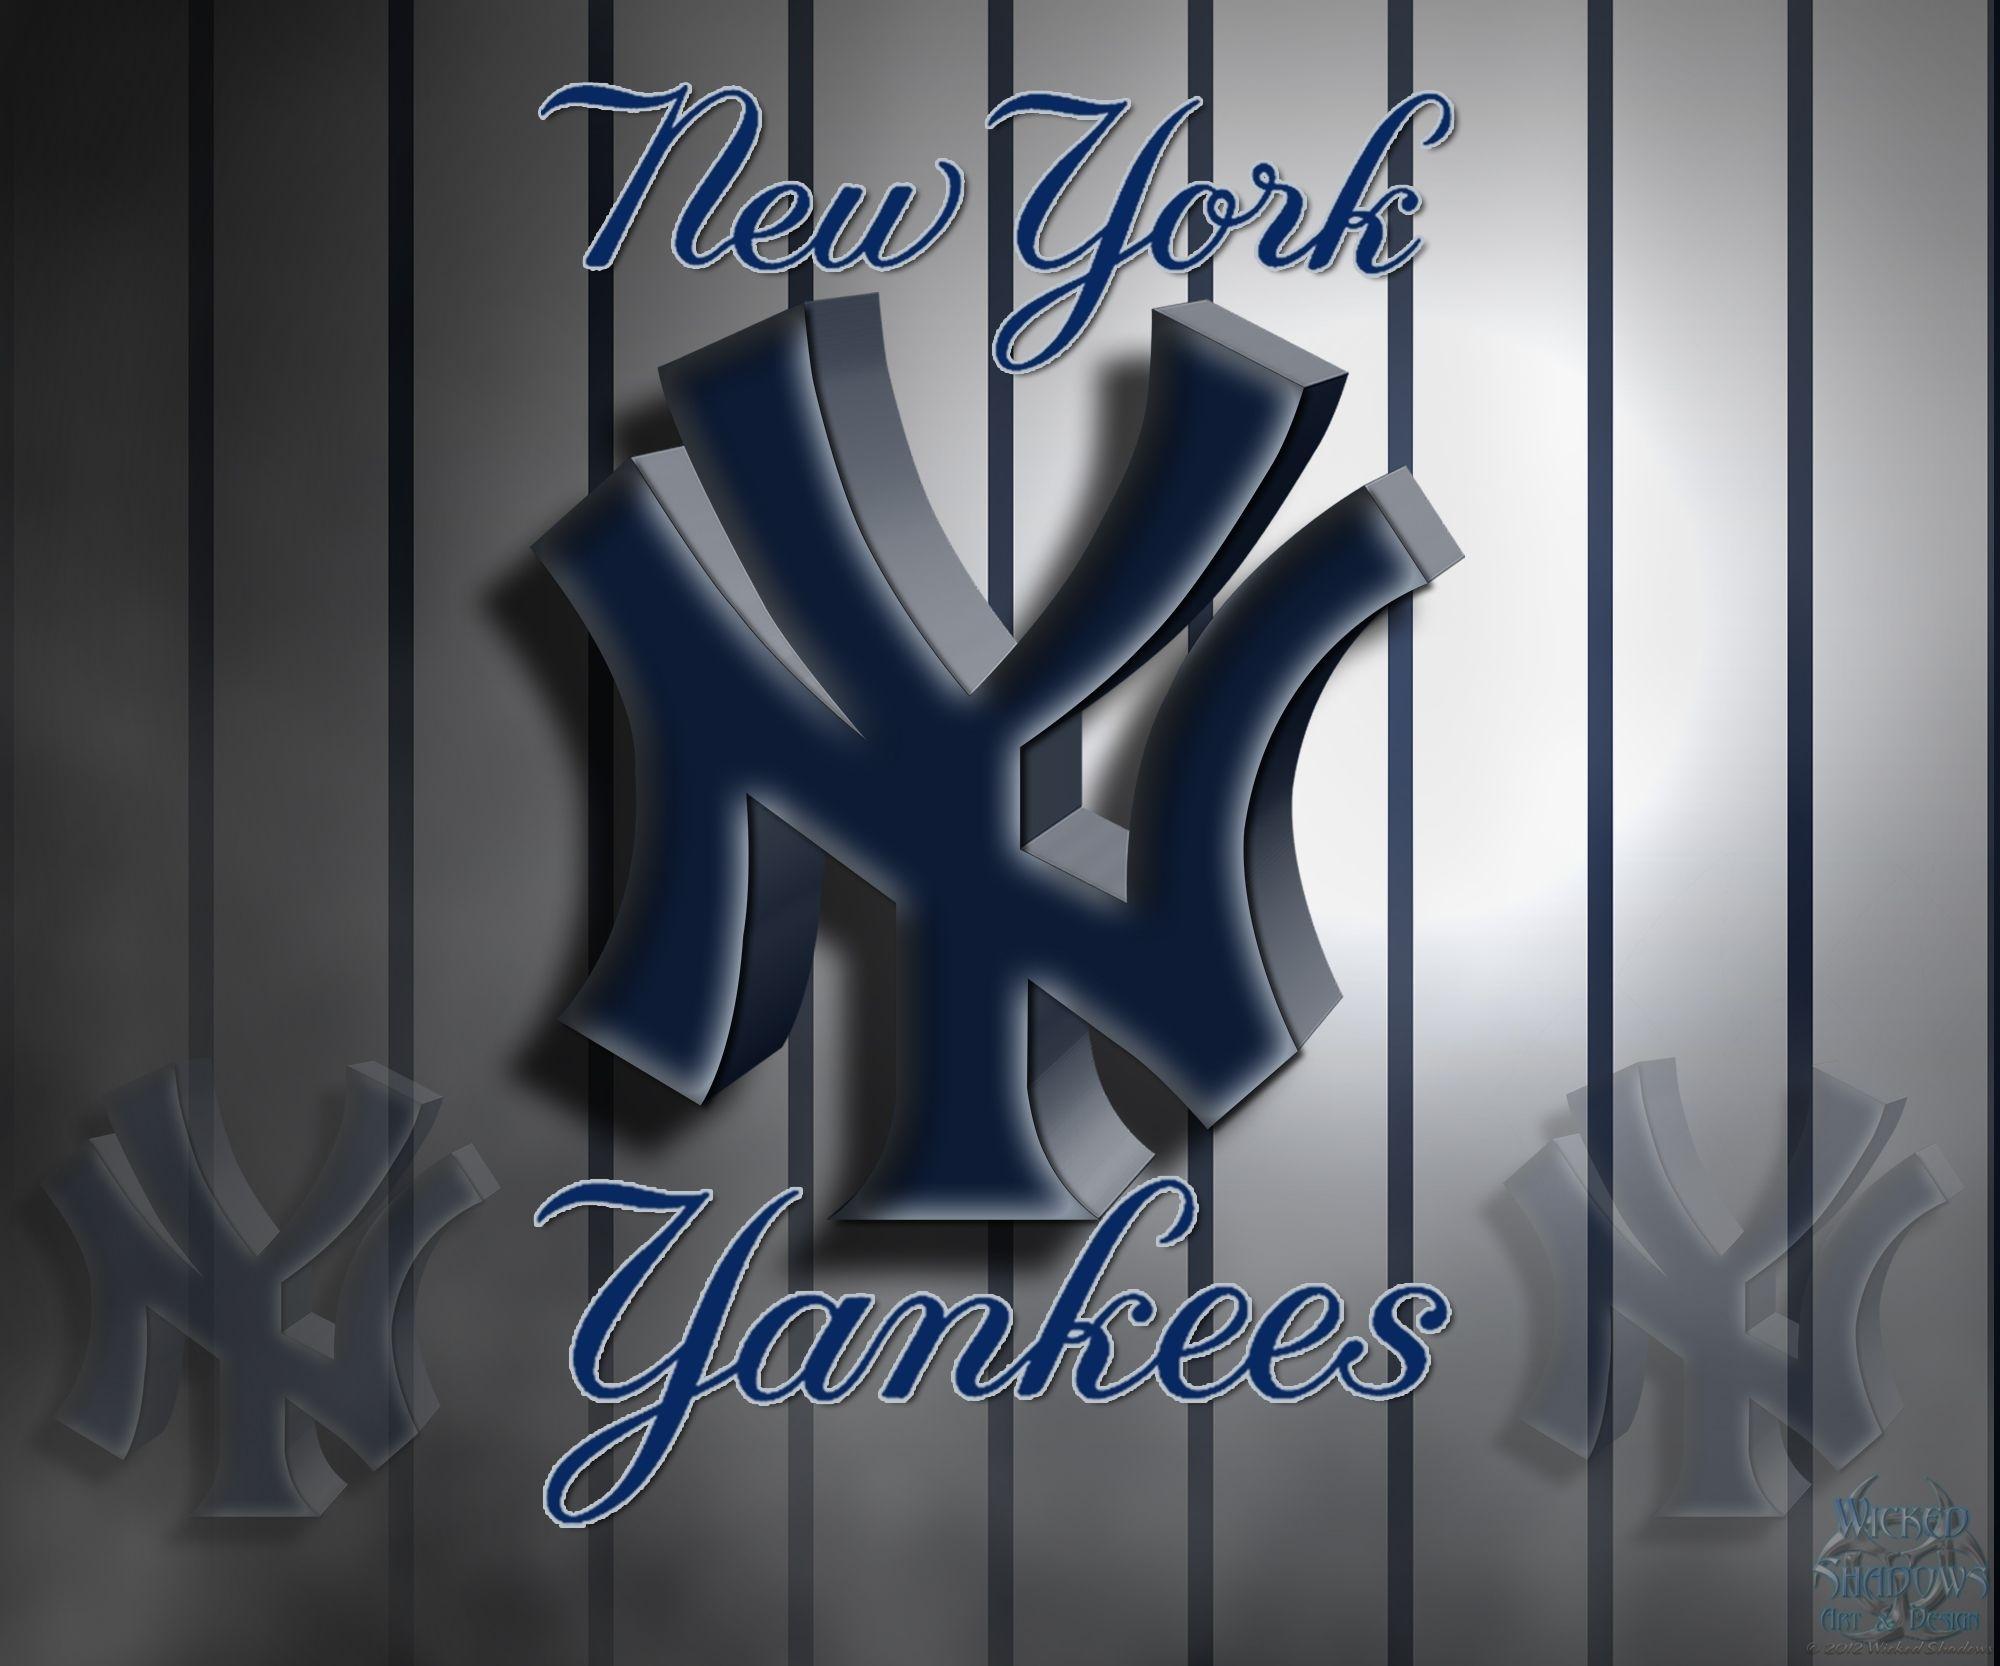 Title : logo new york yankees wallpaper – http://69hdwallpapers/logo-new. Dimension : 2000 x 1666. File Type : JPG/JPEG